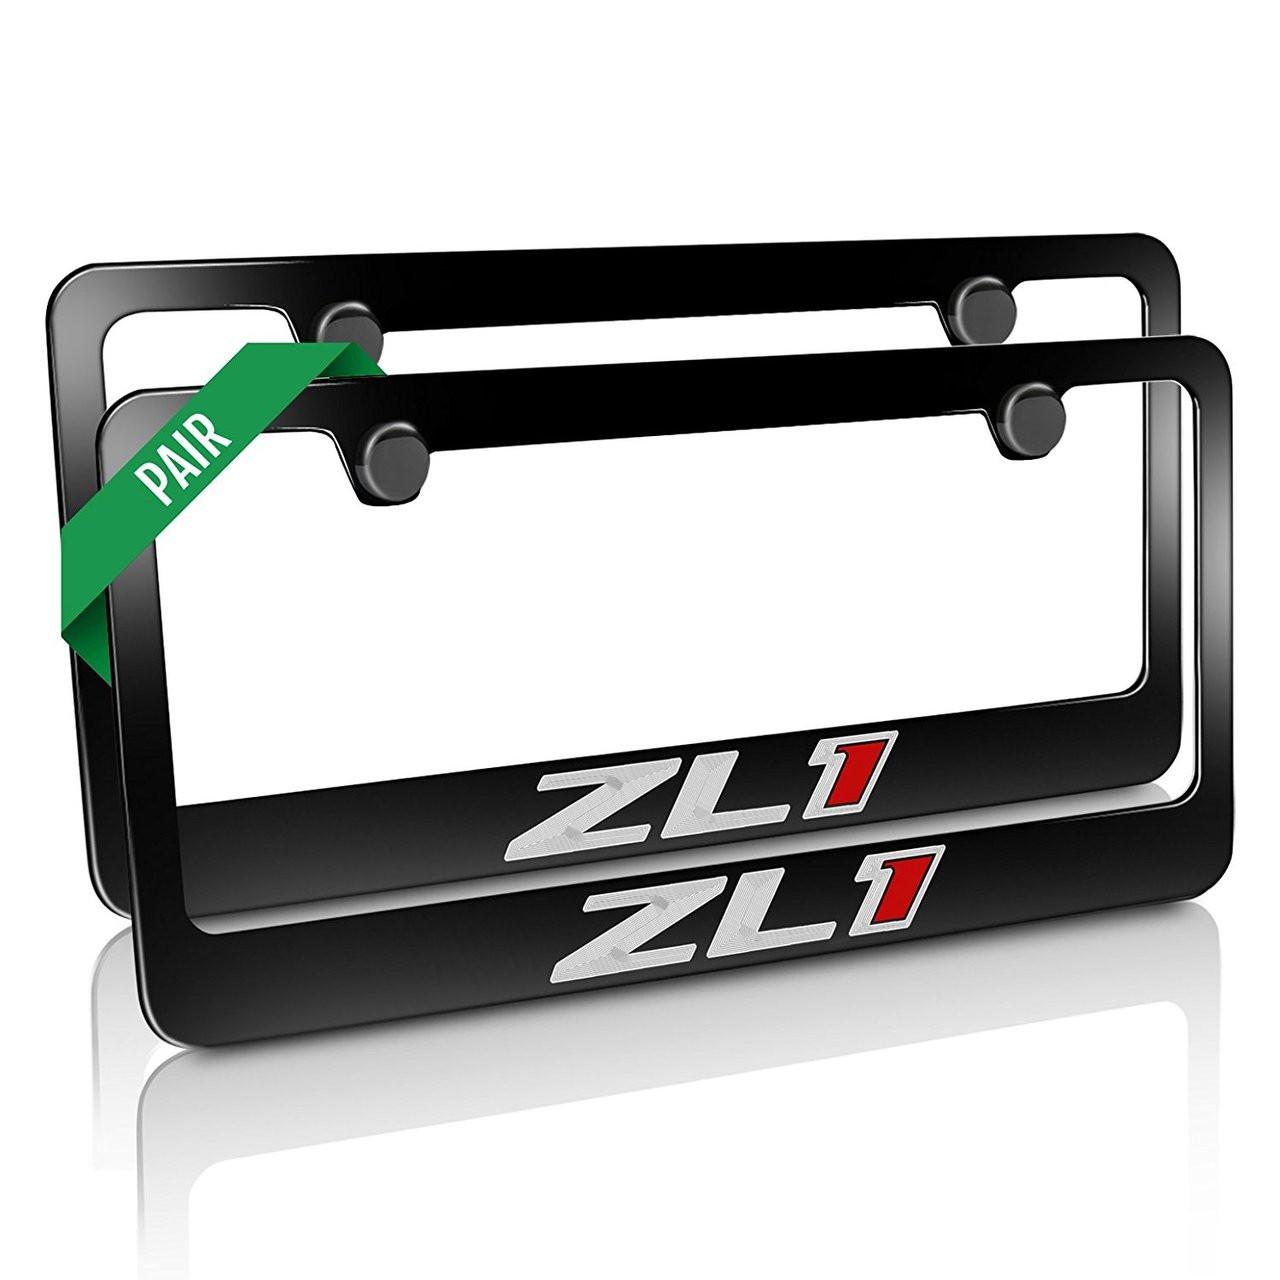 2 Chevrolet Camaro ZL1Black Metal Engraved License Plate Frames ...